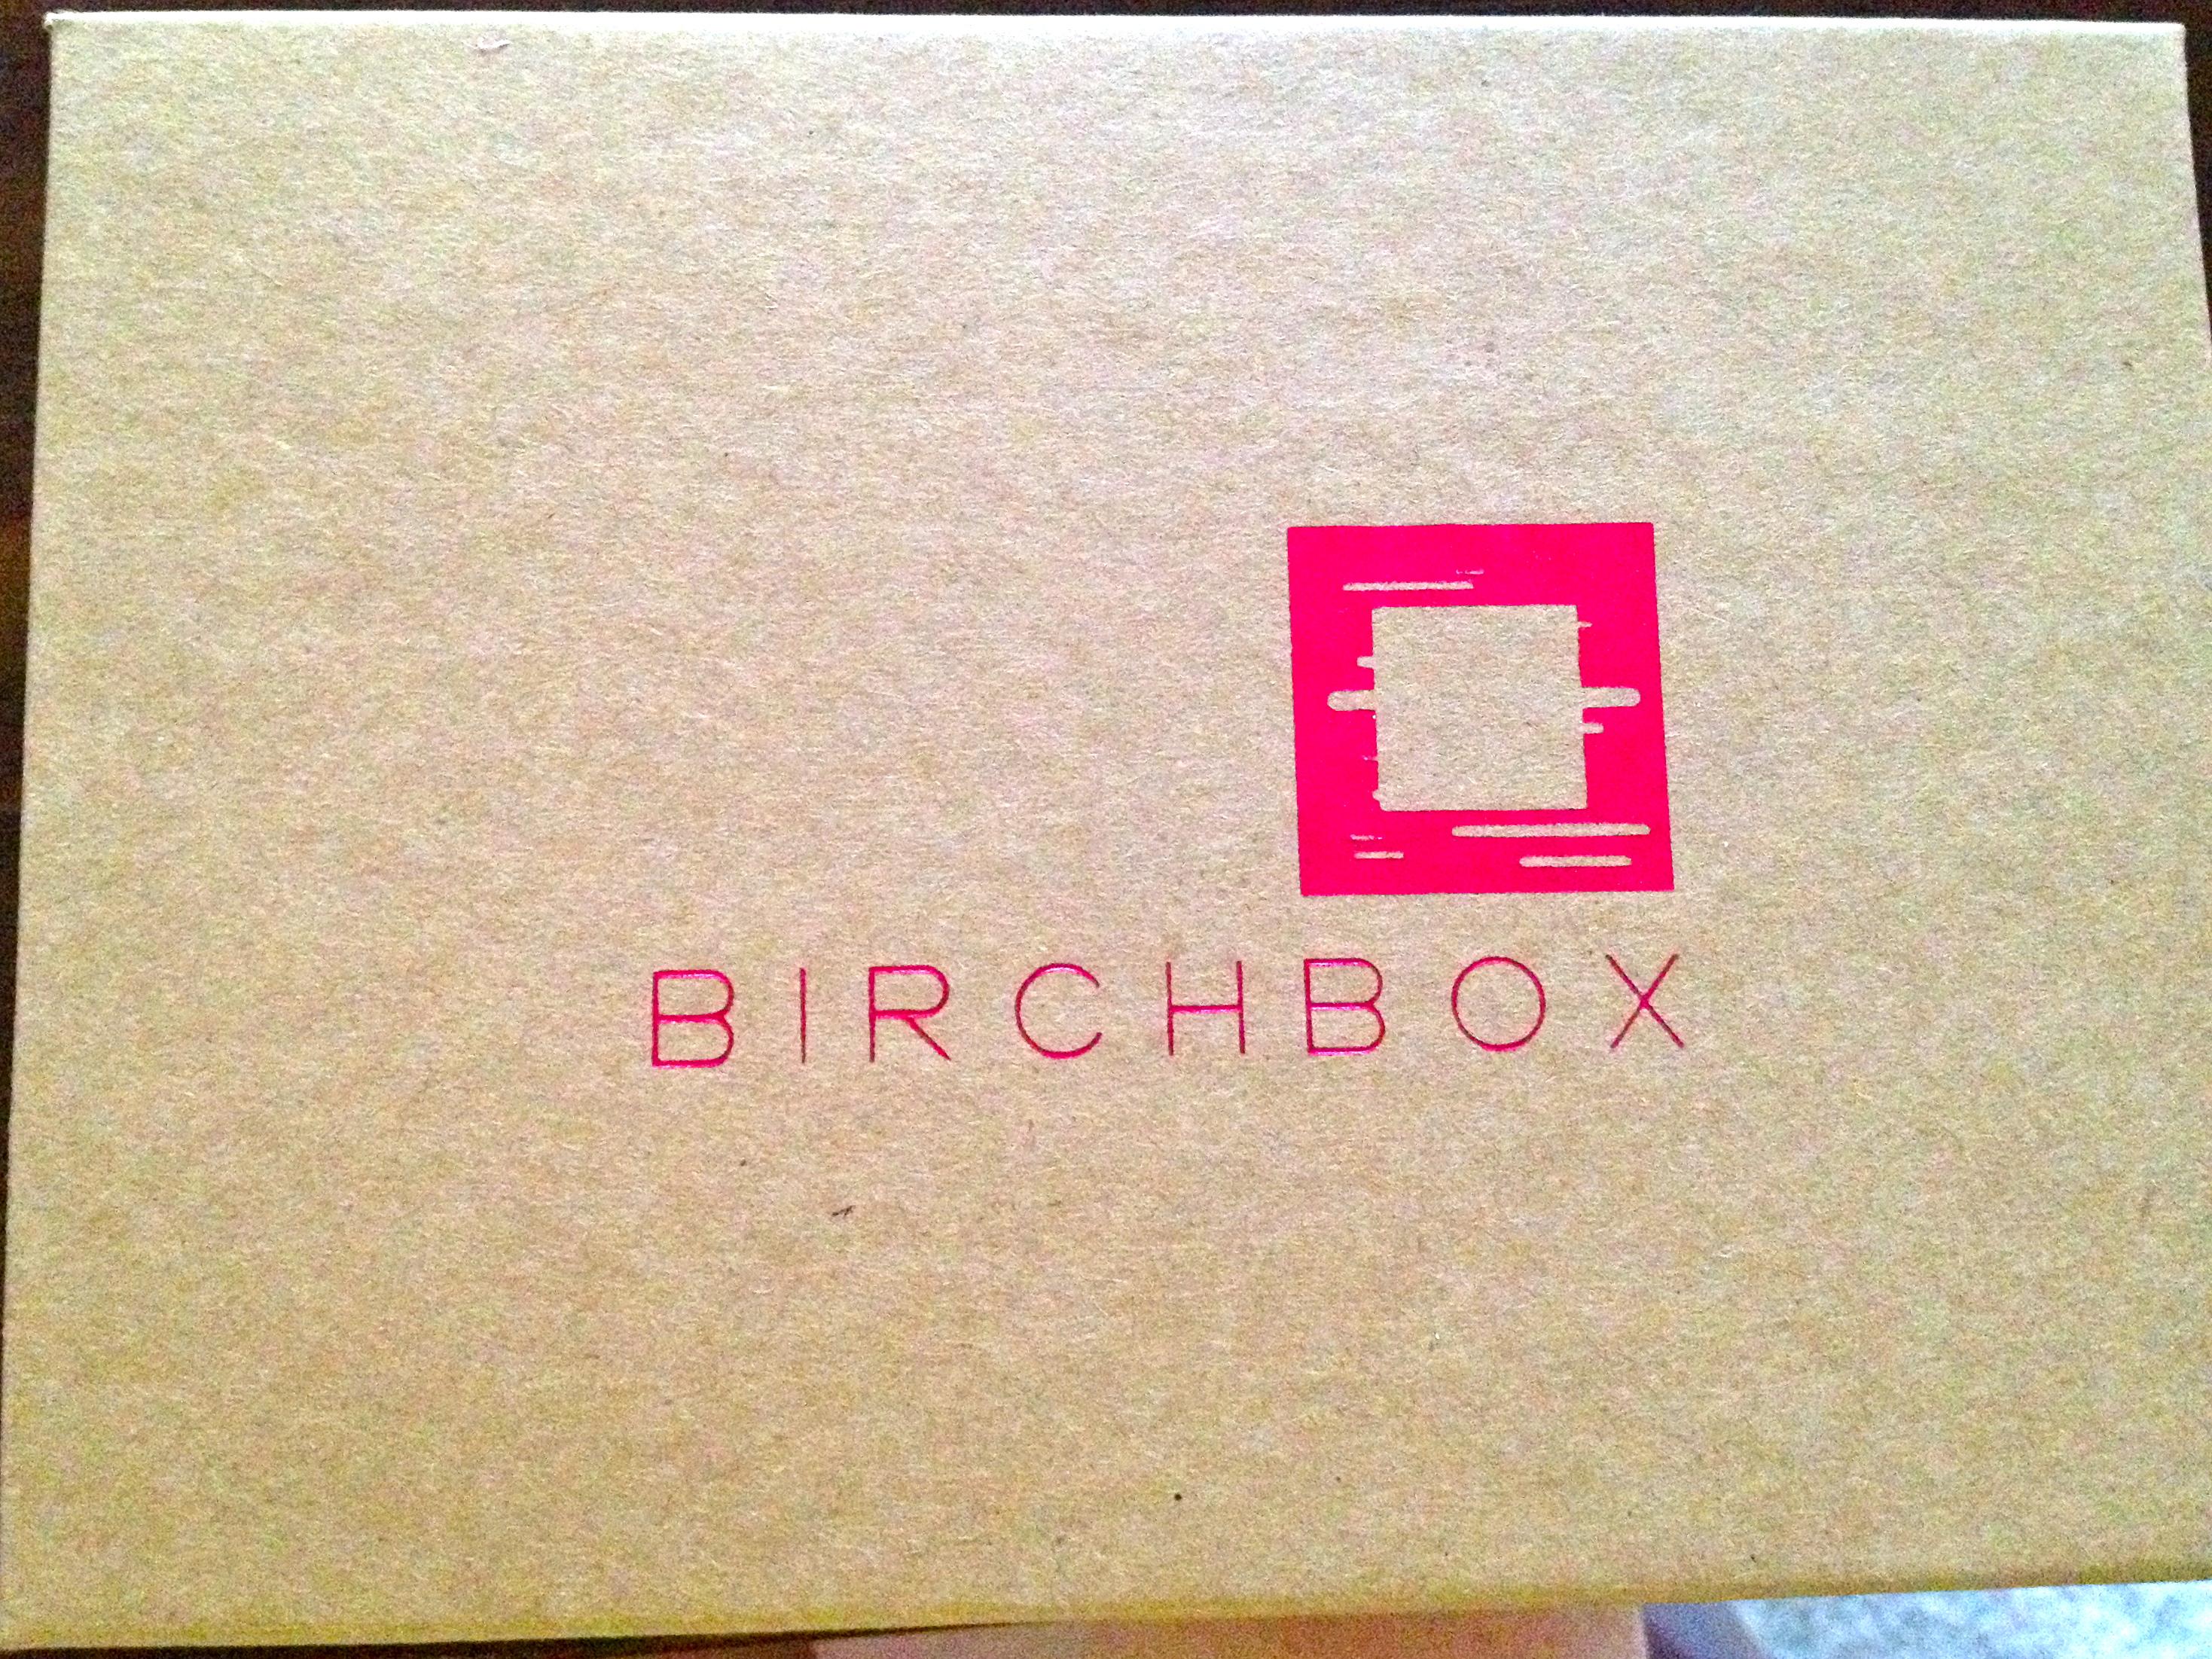 Do You Birchbox?